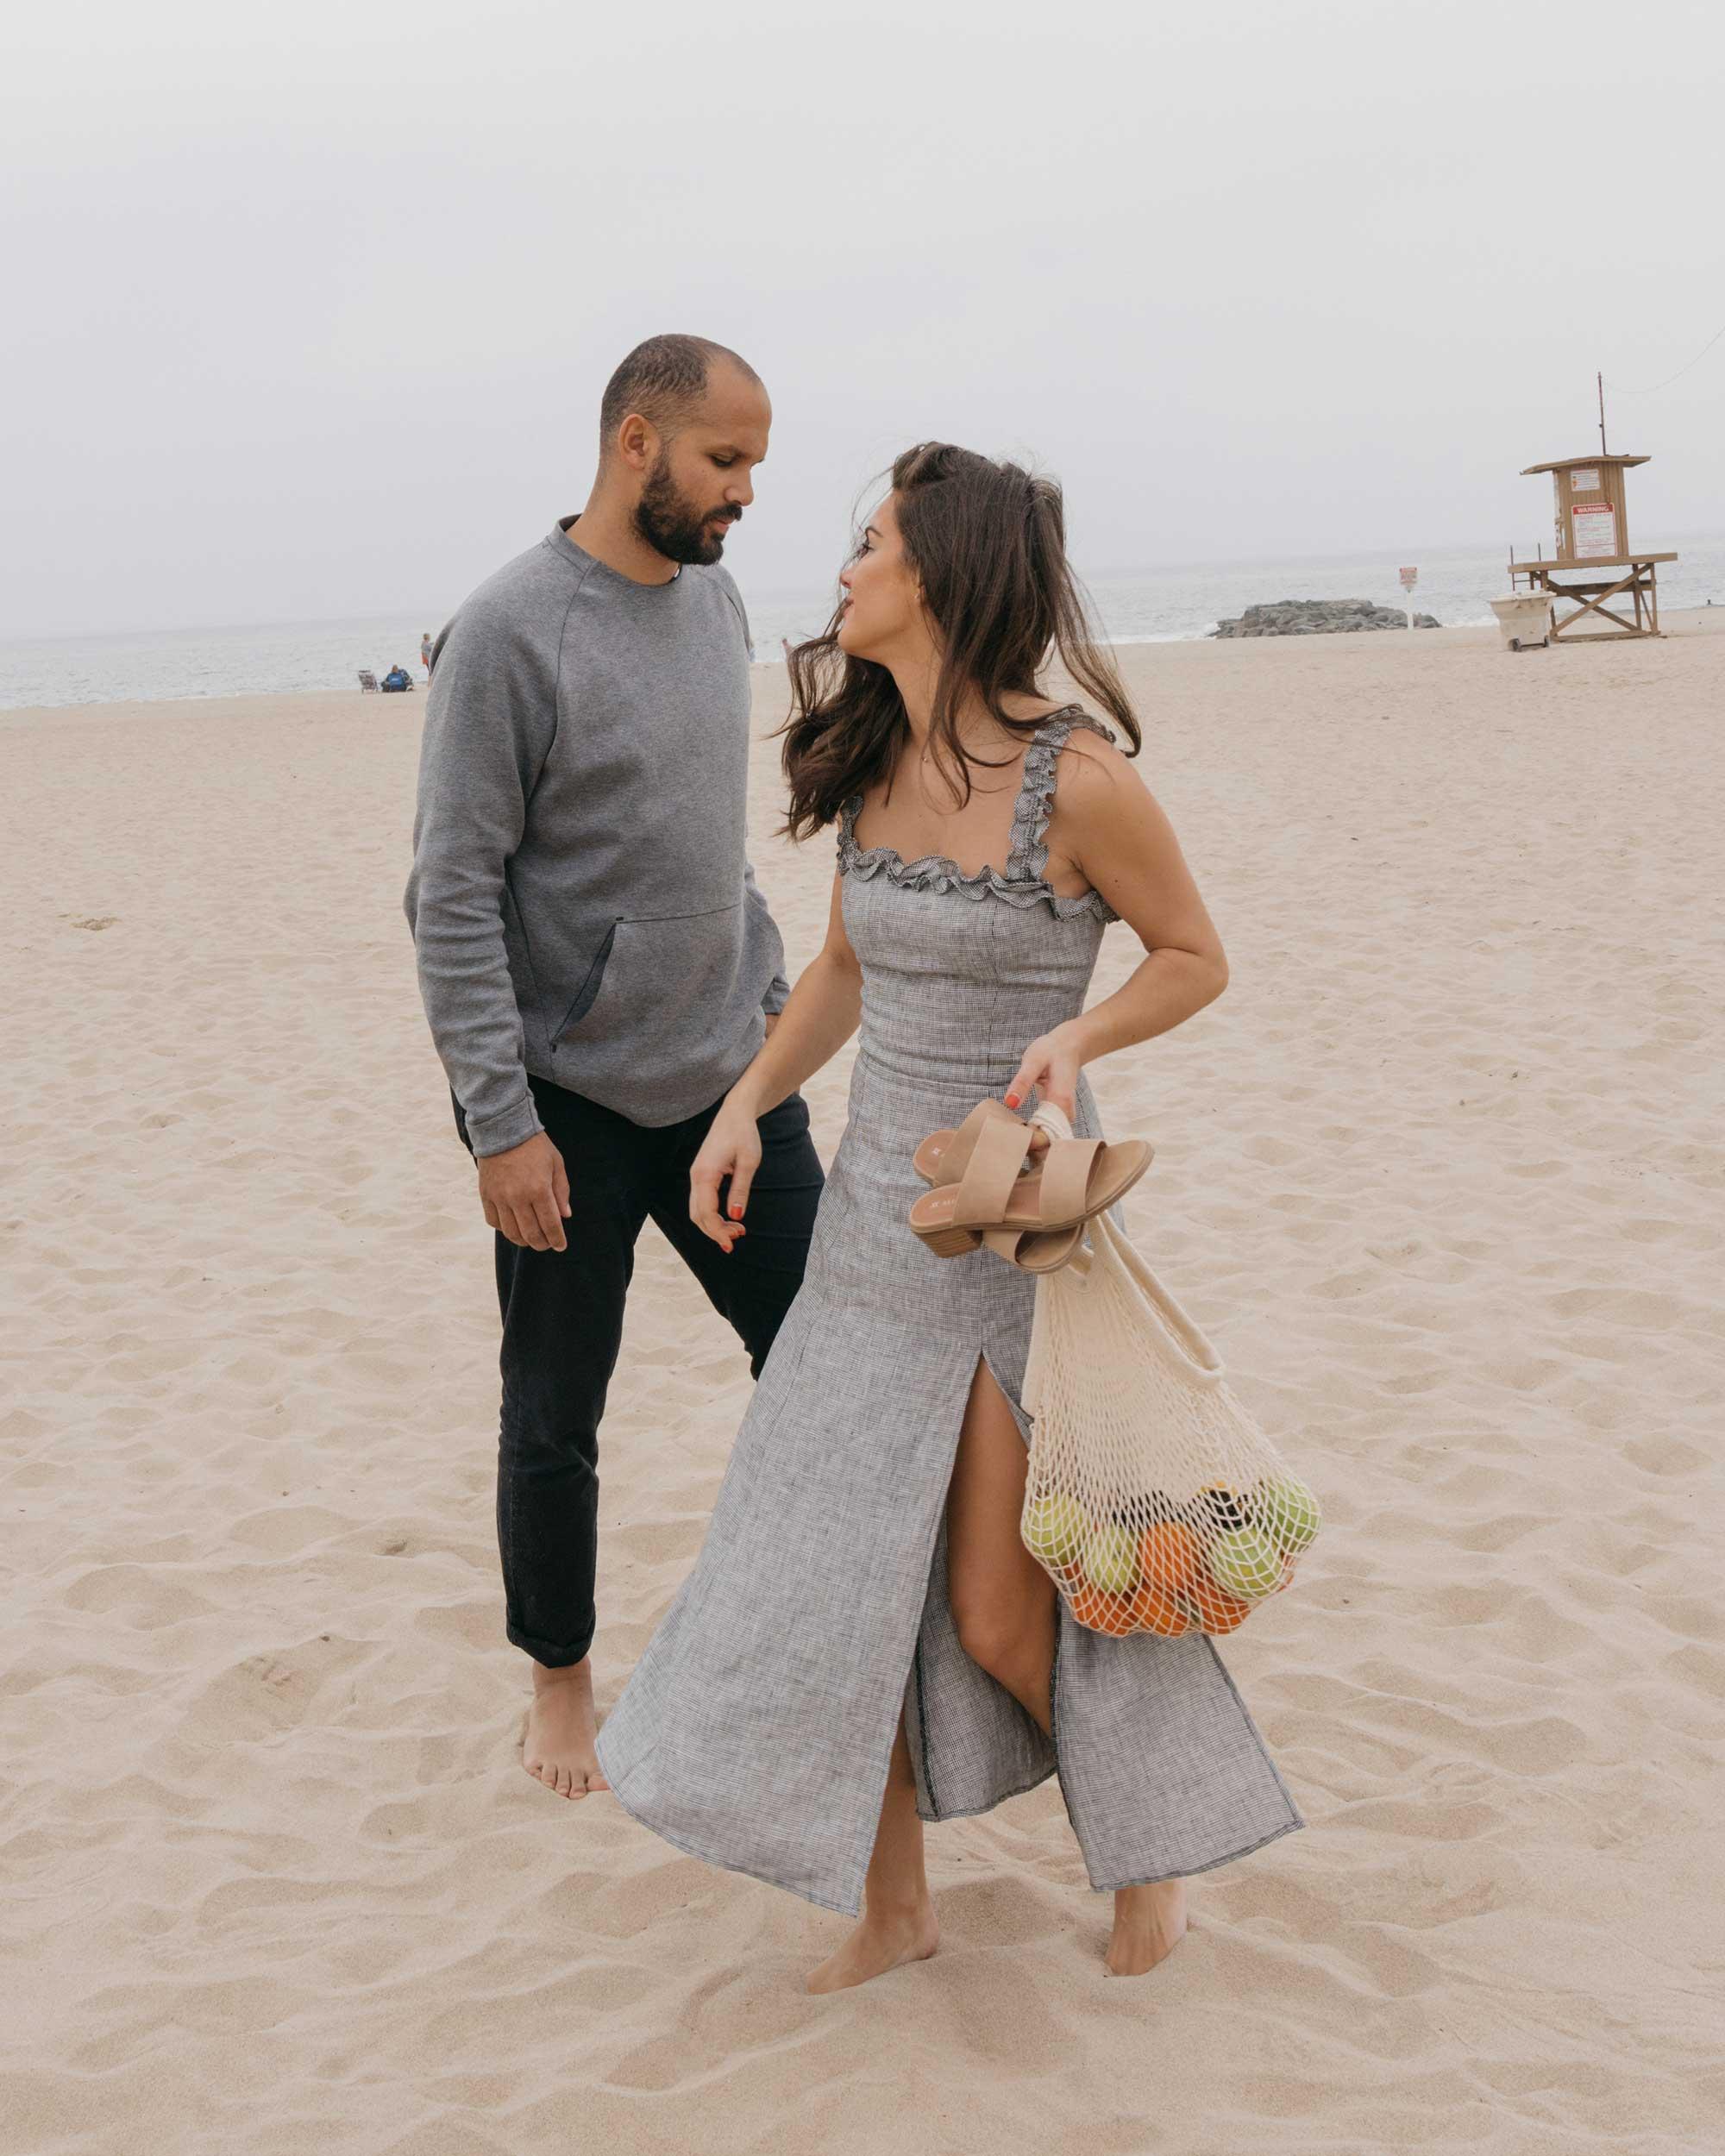 Reformation Lavendar Midi Dress Cotton Net Shopping Tote Newport Beach California Summer Outfit17.jpg